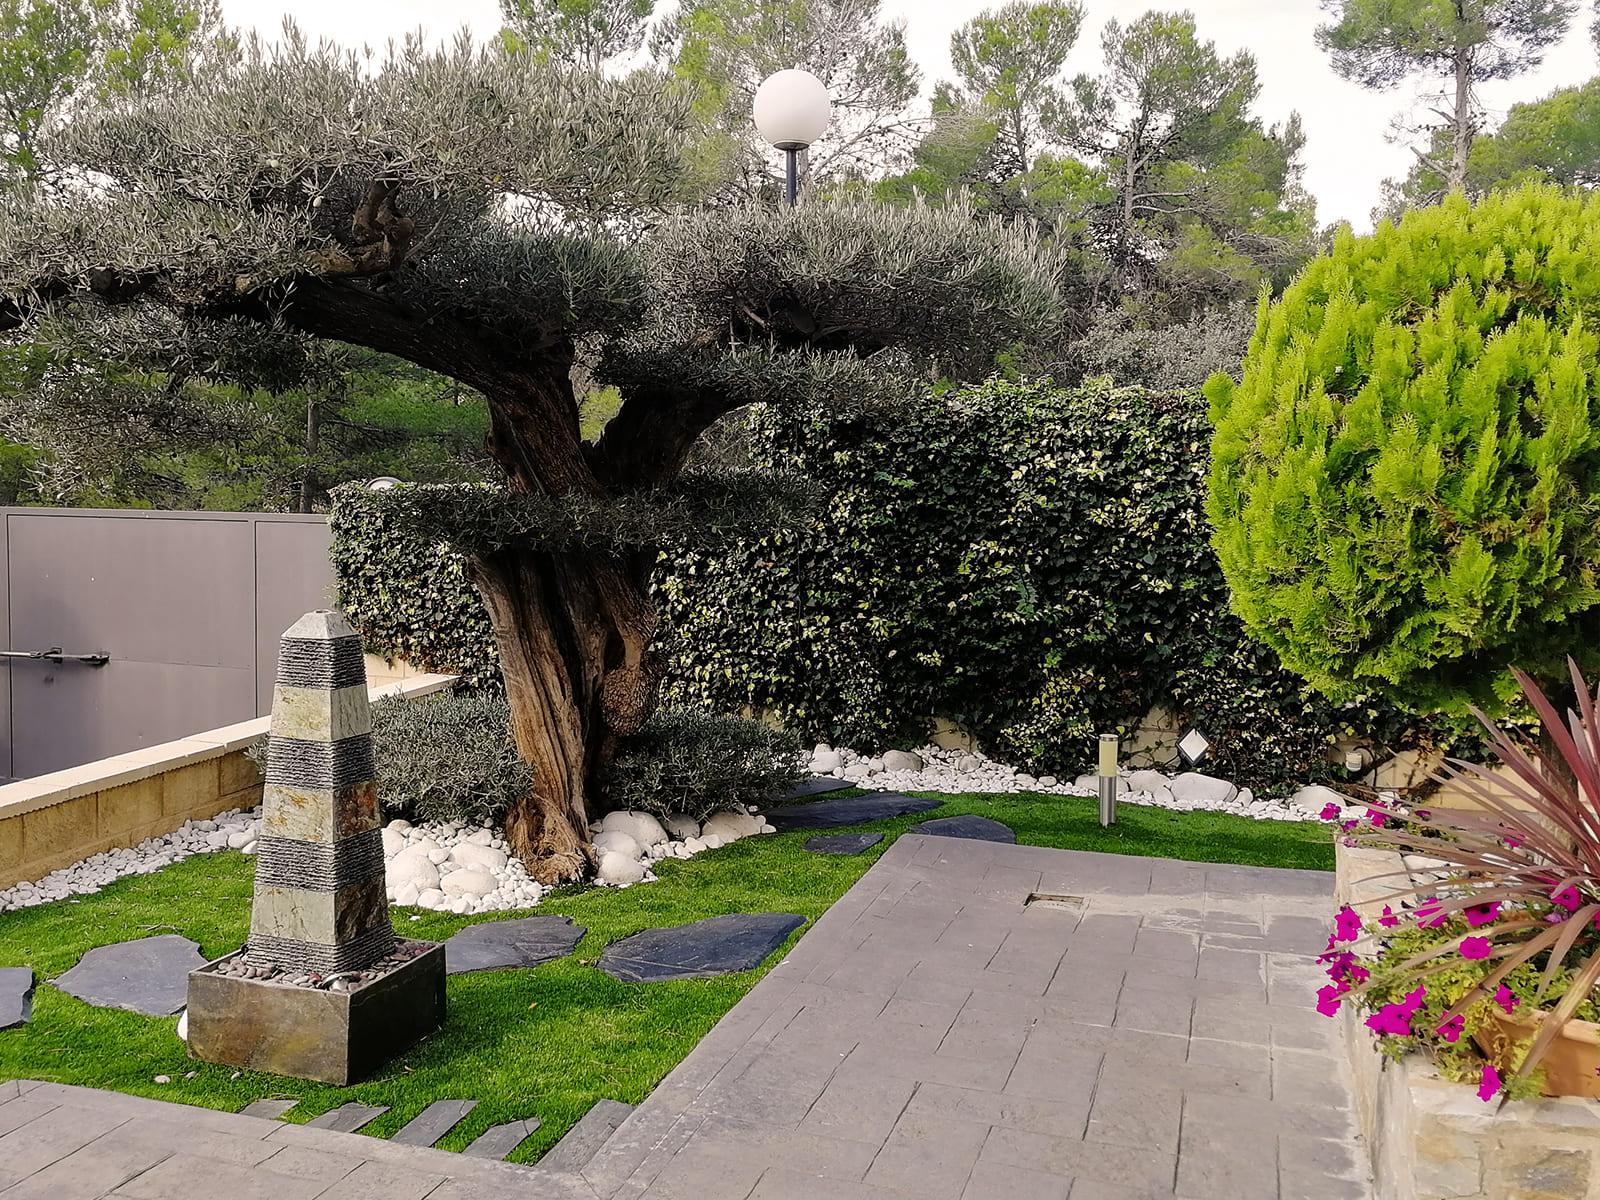 diseño-jardines-espacio-olivo-MM-03_HIDROJARDIN-Bañeres